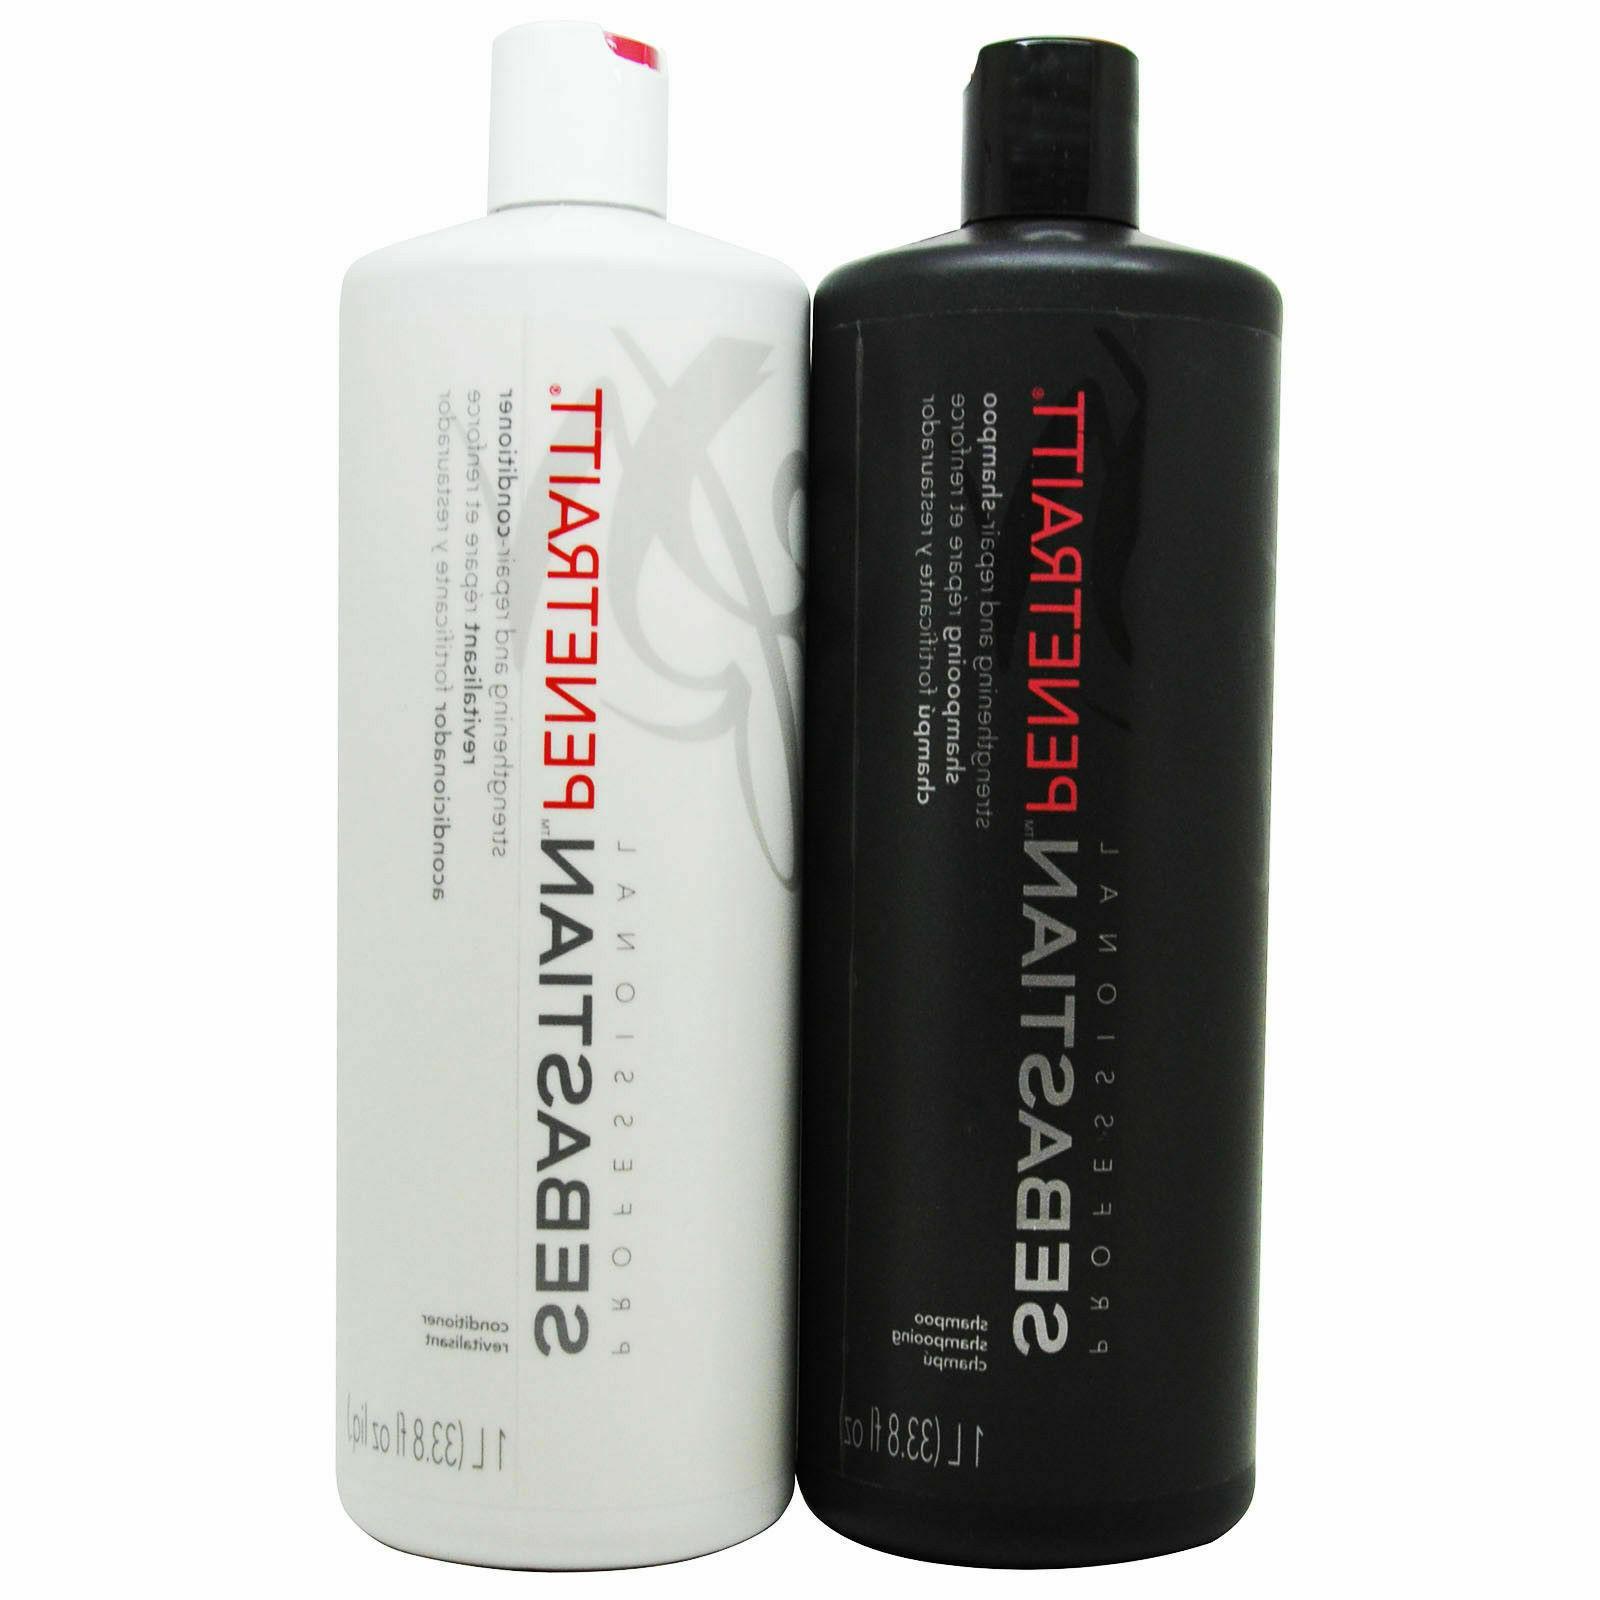 penetraitt shampoo and conditioner 1 liter 33